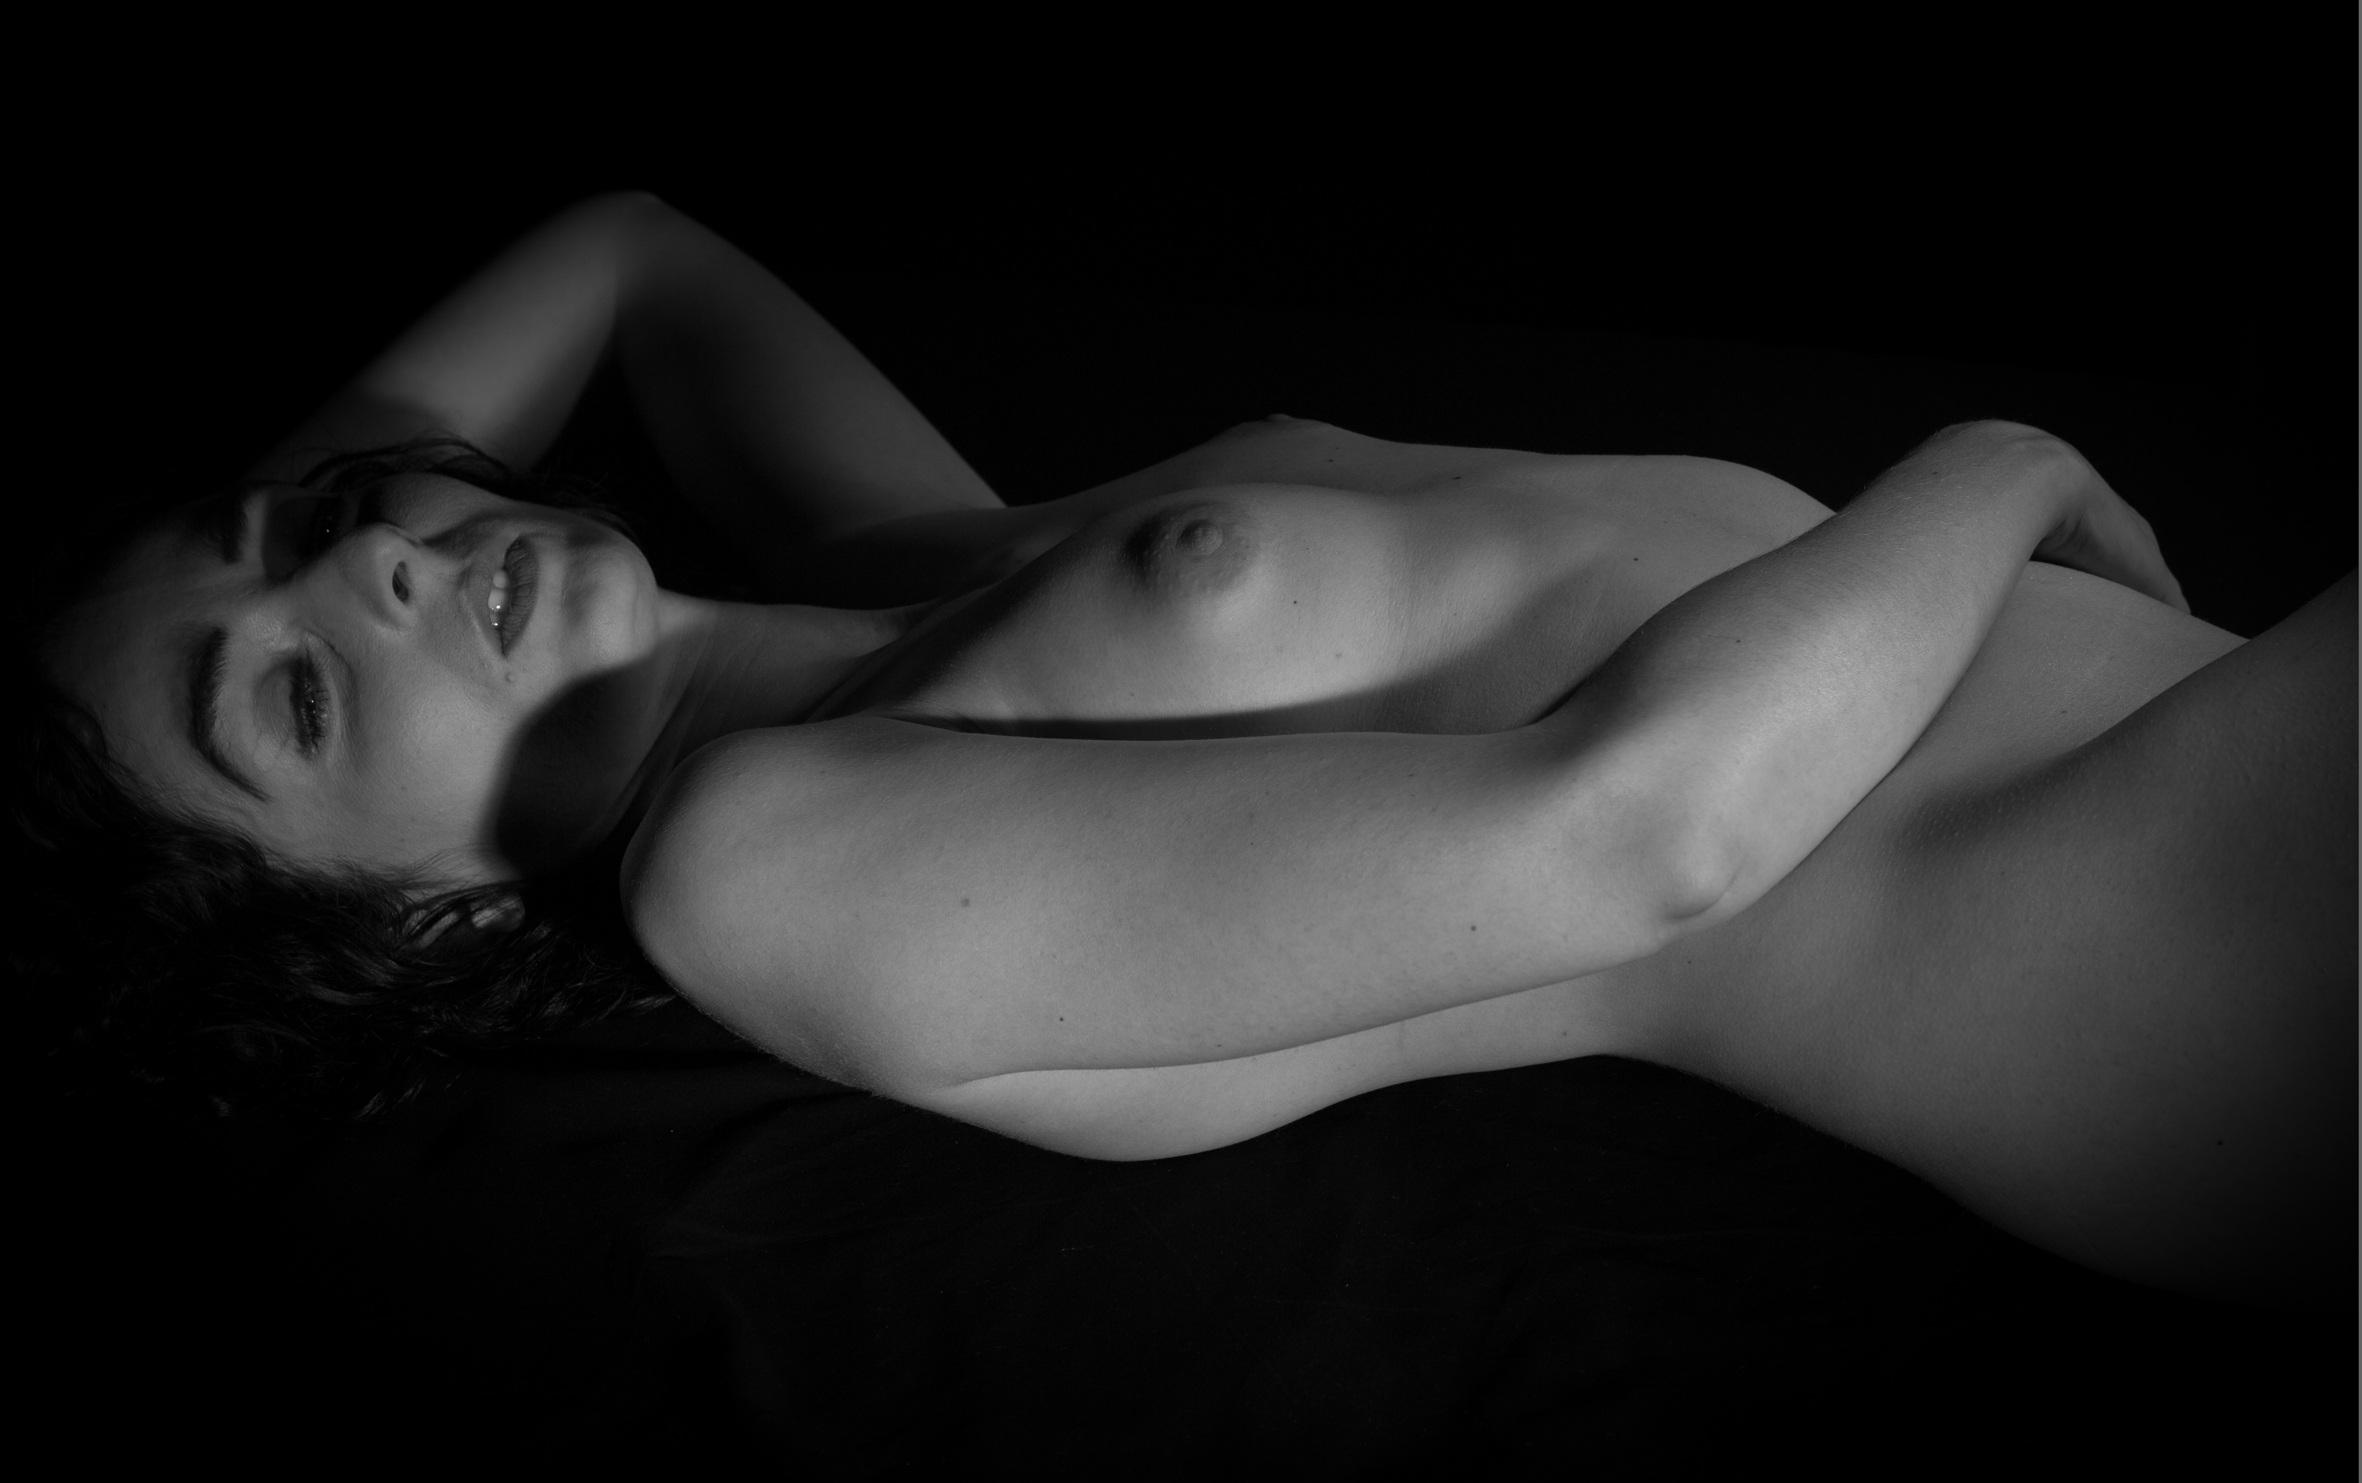 nøgne model fotograferinggay porn shower scene